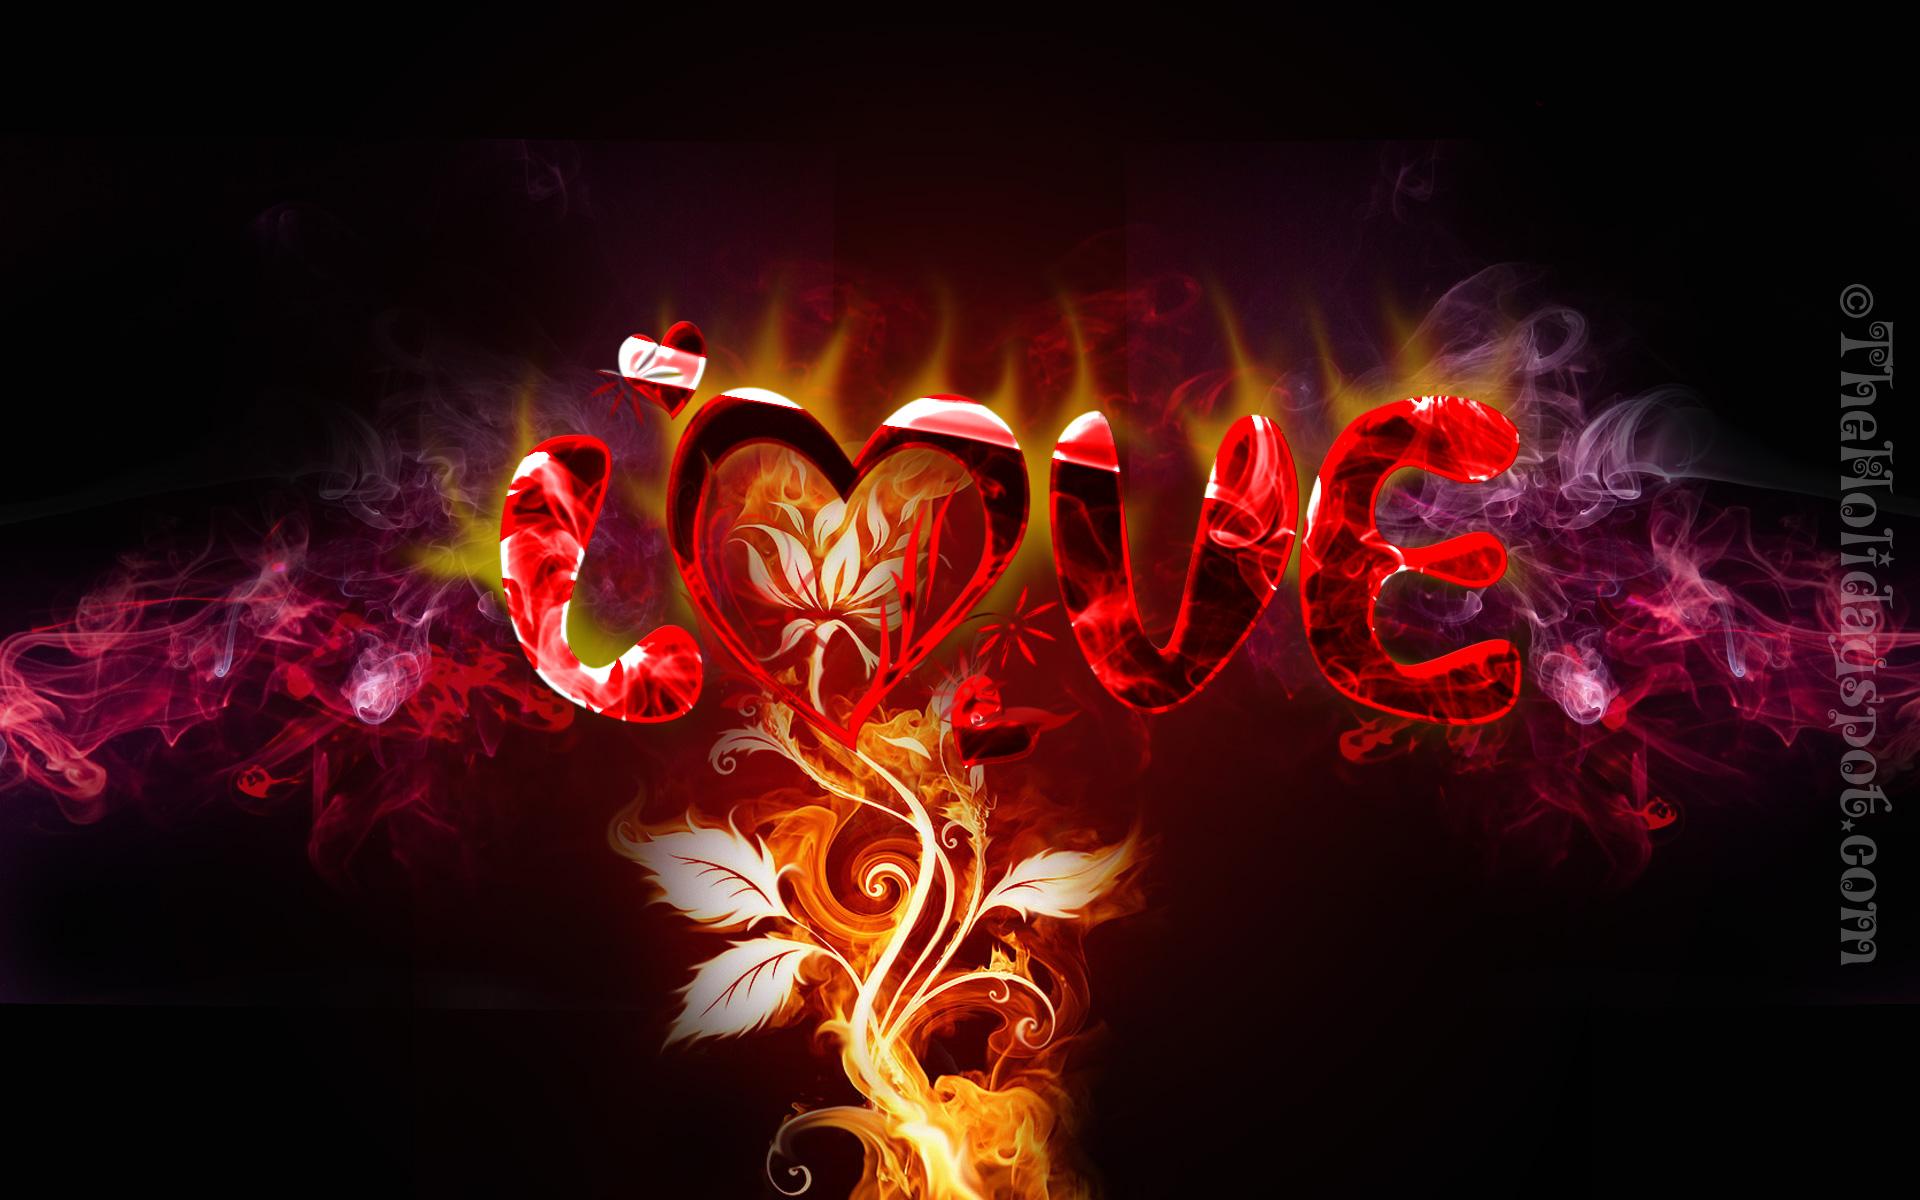 ��� ��, ���� ��� ���� 2016 Love , ���� ��� ���� ������ ���������� ������� 2015_1391459565_842.